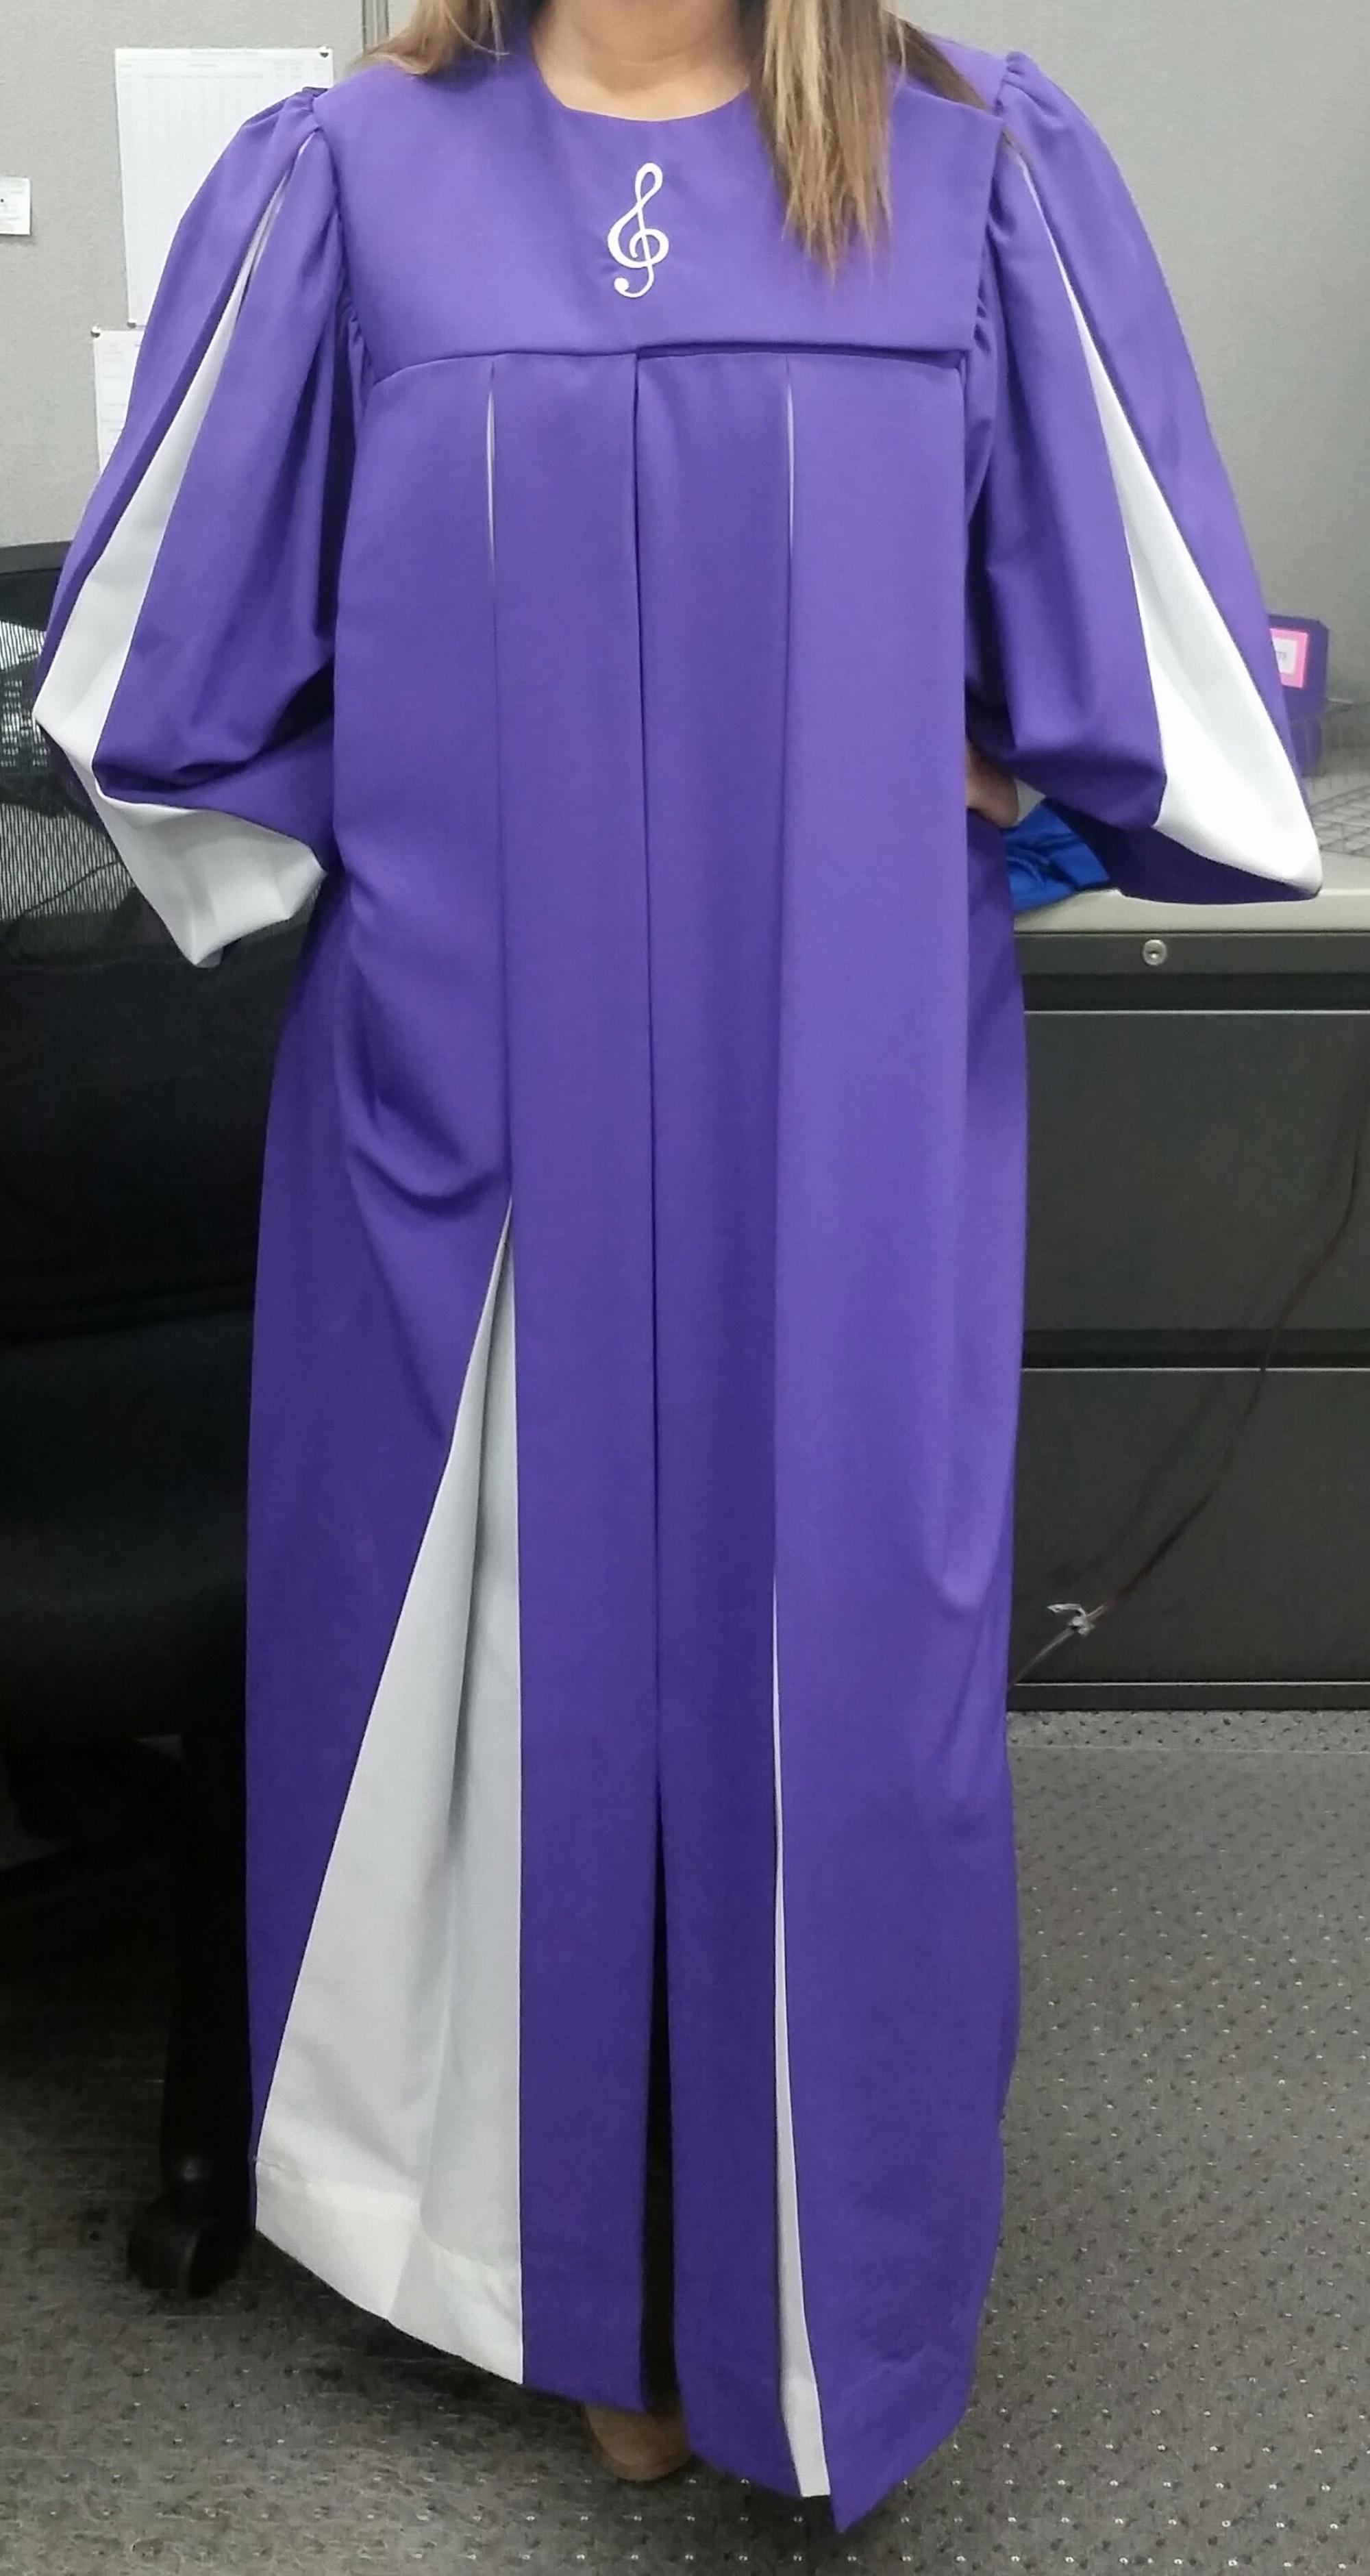 Modern Design Choir Robes Buy Modern Choir Robes Design For Choir Robe Choir Robe Product On Alibaba Com